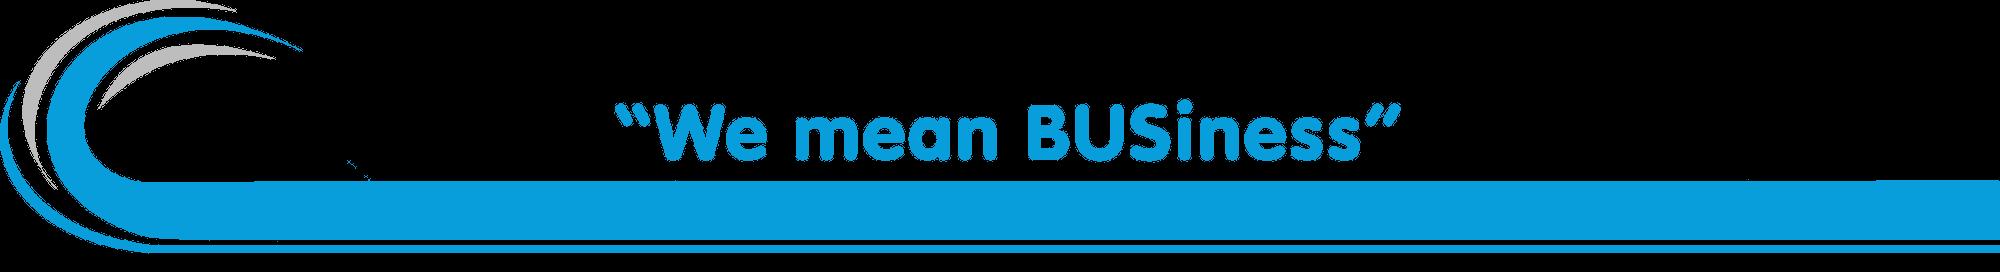 slogan-two